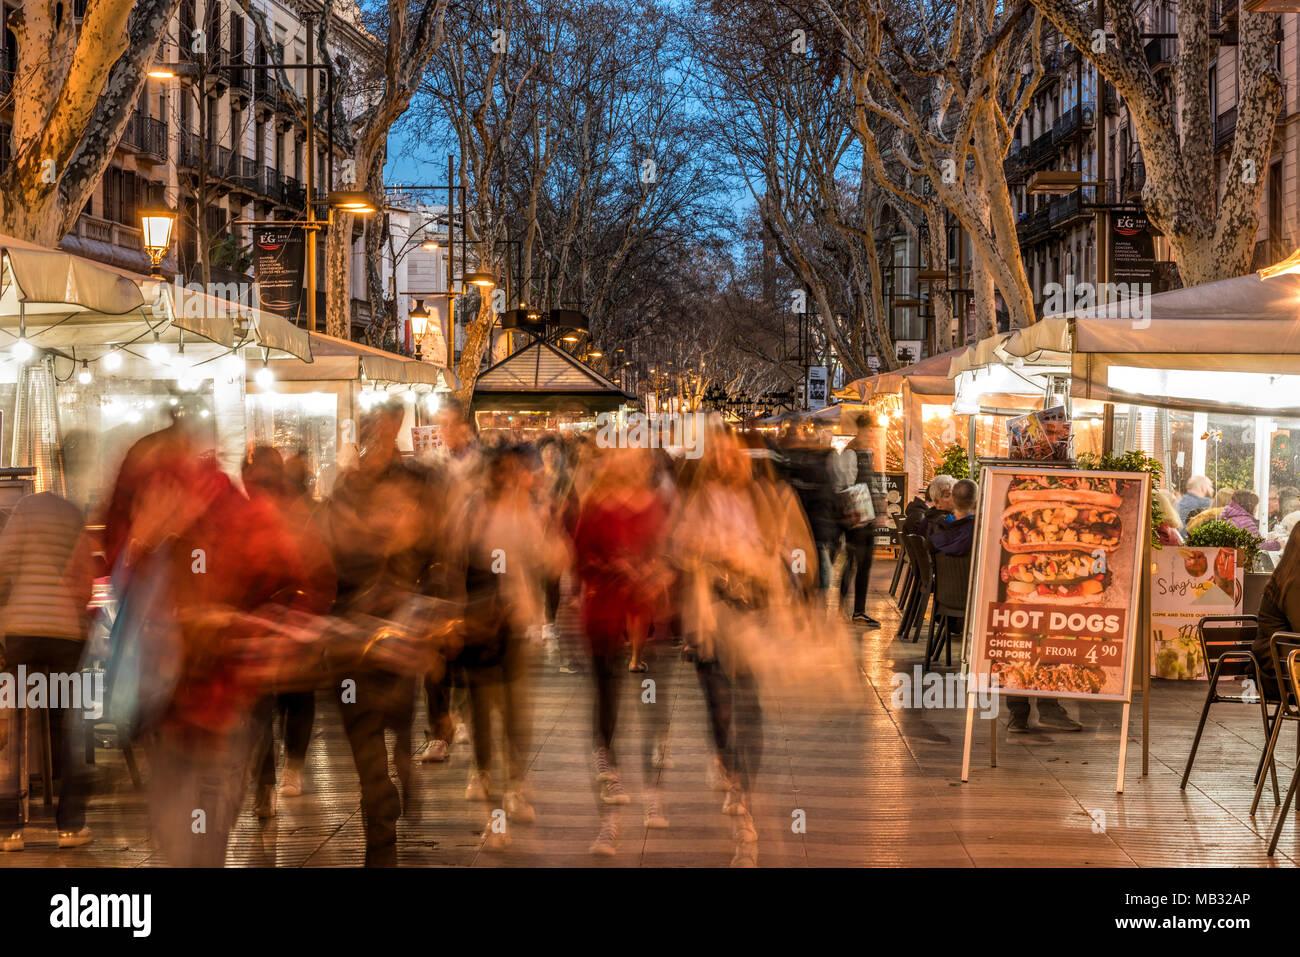 Touristen flanieren entlang der weltweit berühmten Rambla Fußgängerzone, Barcelona, Katalonien, Spanien Stockbild